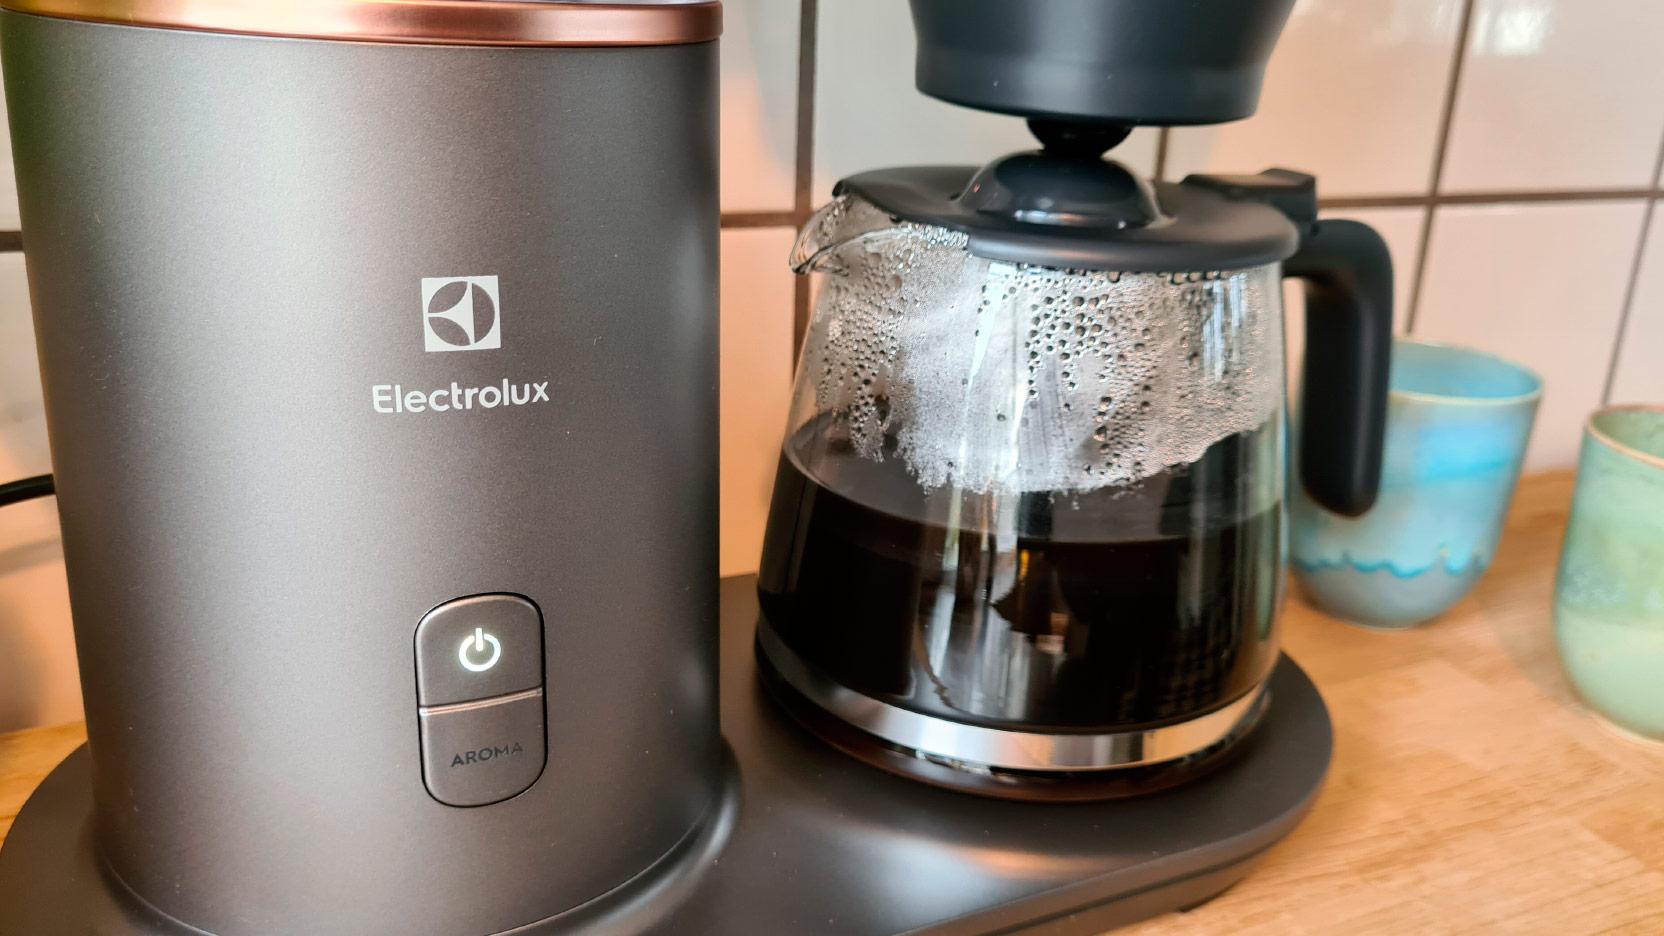 Bild på av-/på-knappen samt aroma-knappen på Electrolux Explore 7 kaffebryggare